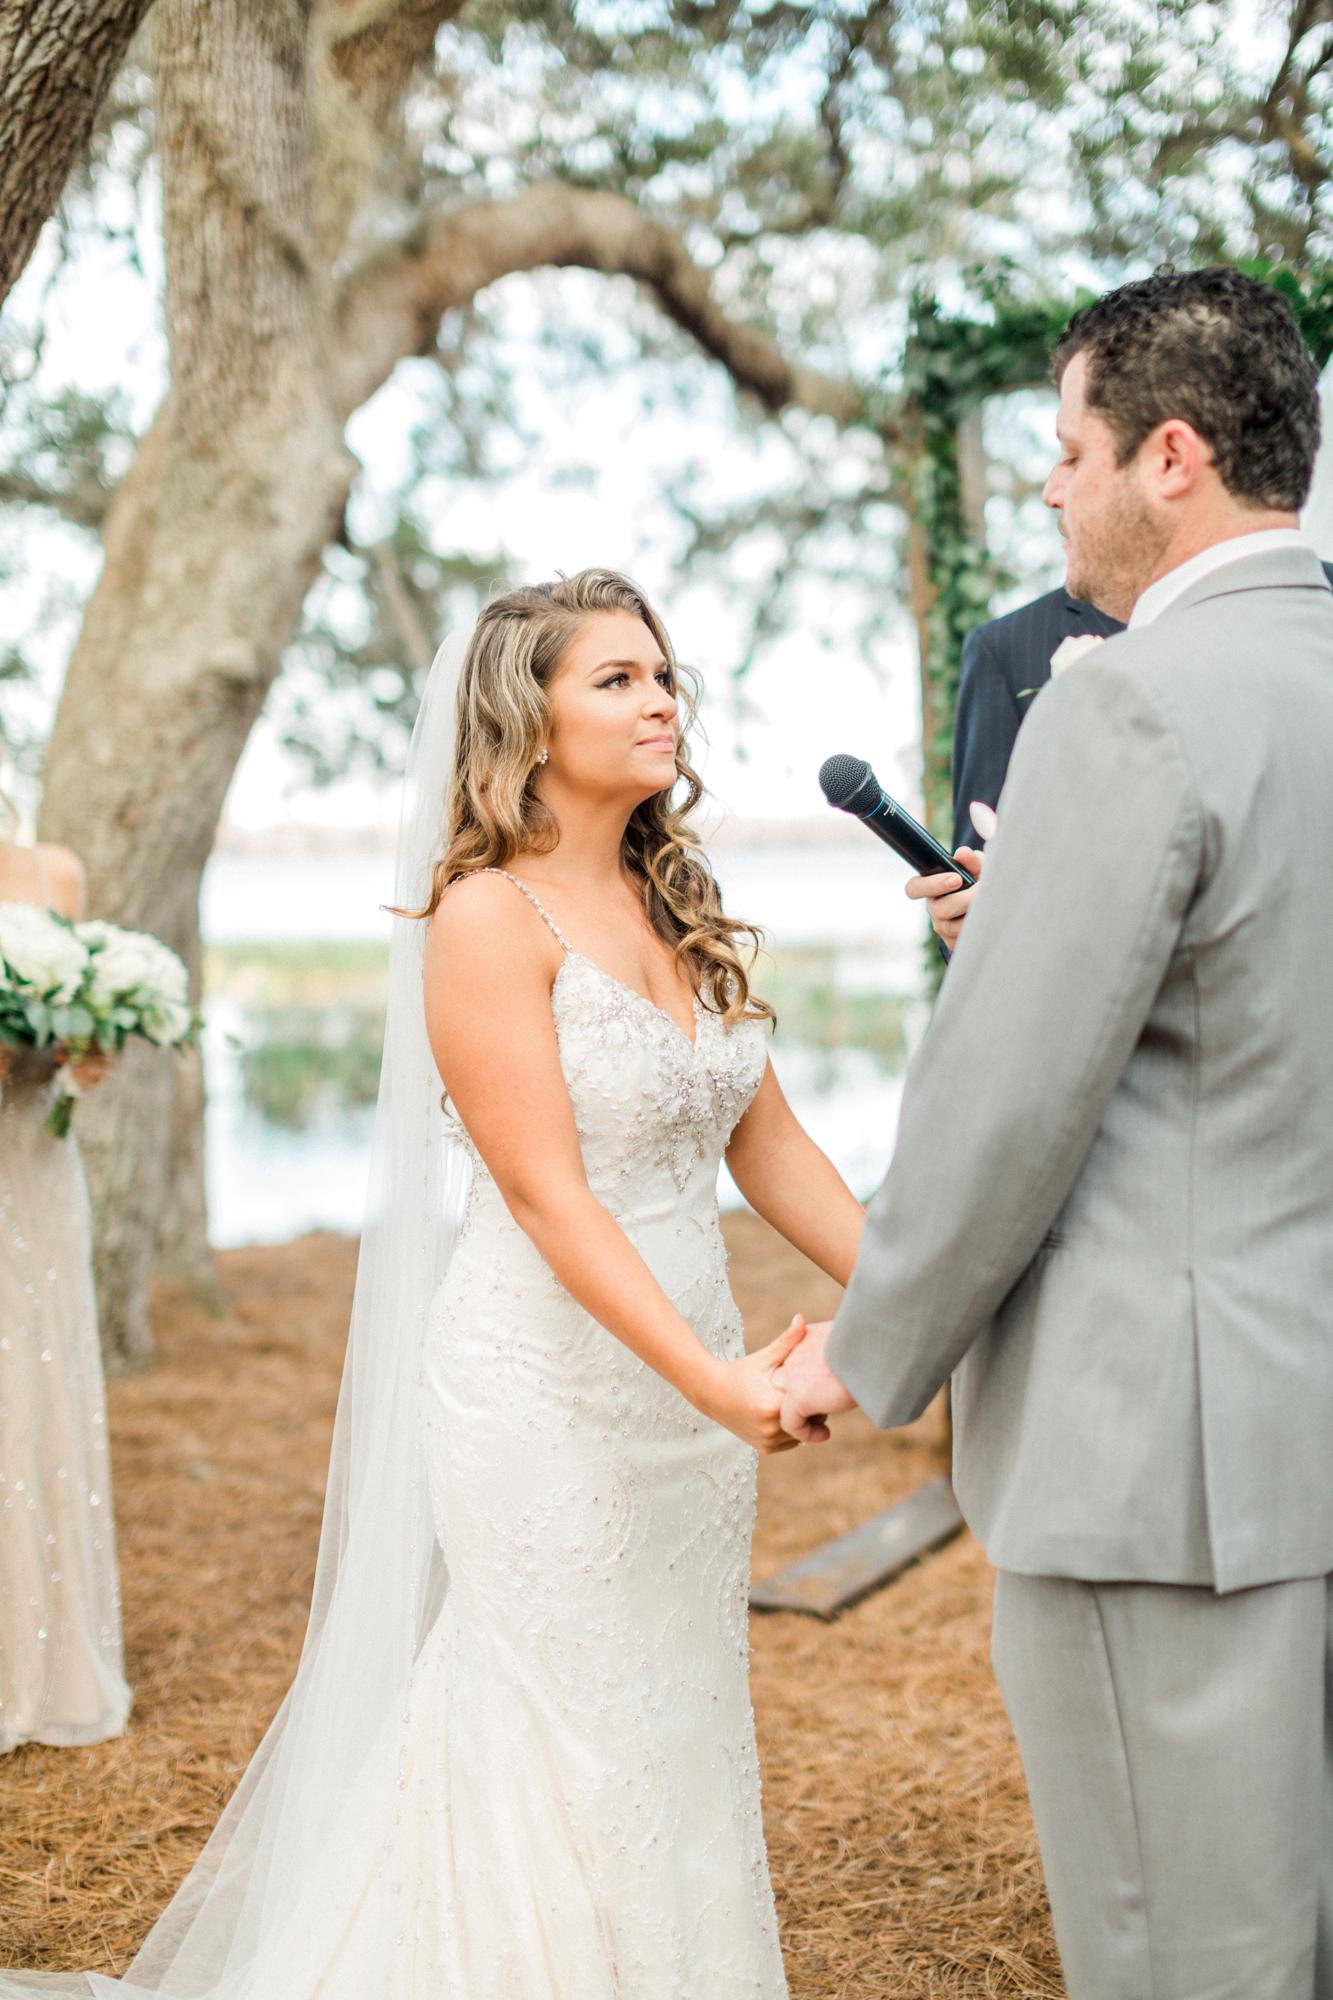 jessica-bellinger-photography-harmony-golf-preserve-wedding-photos-9136.jpg